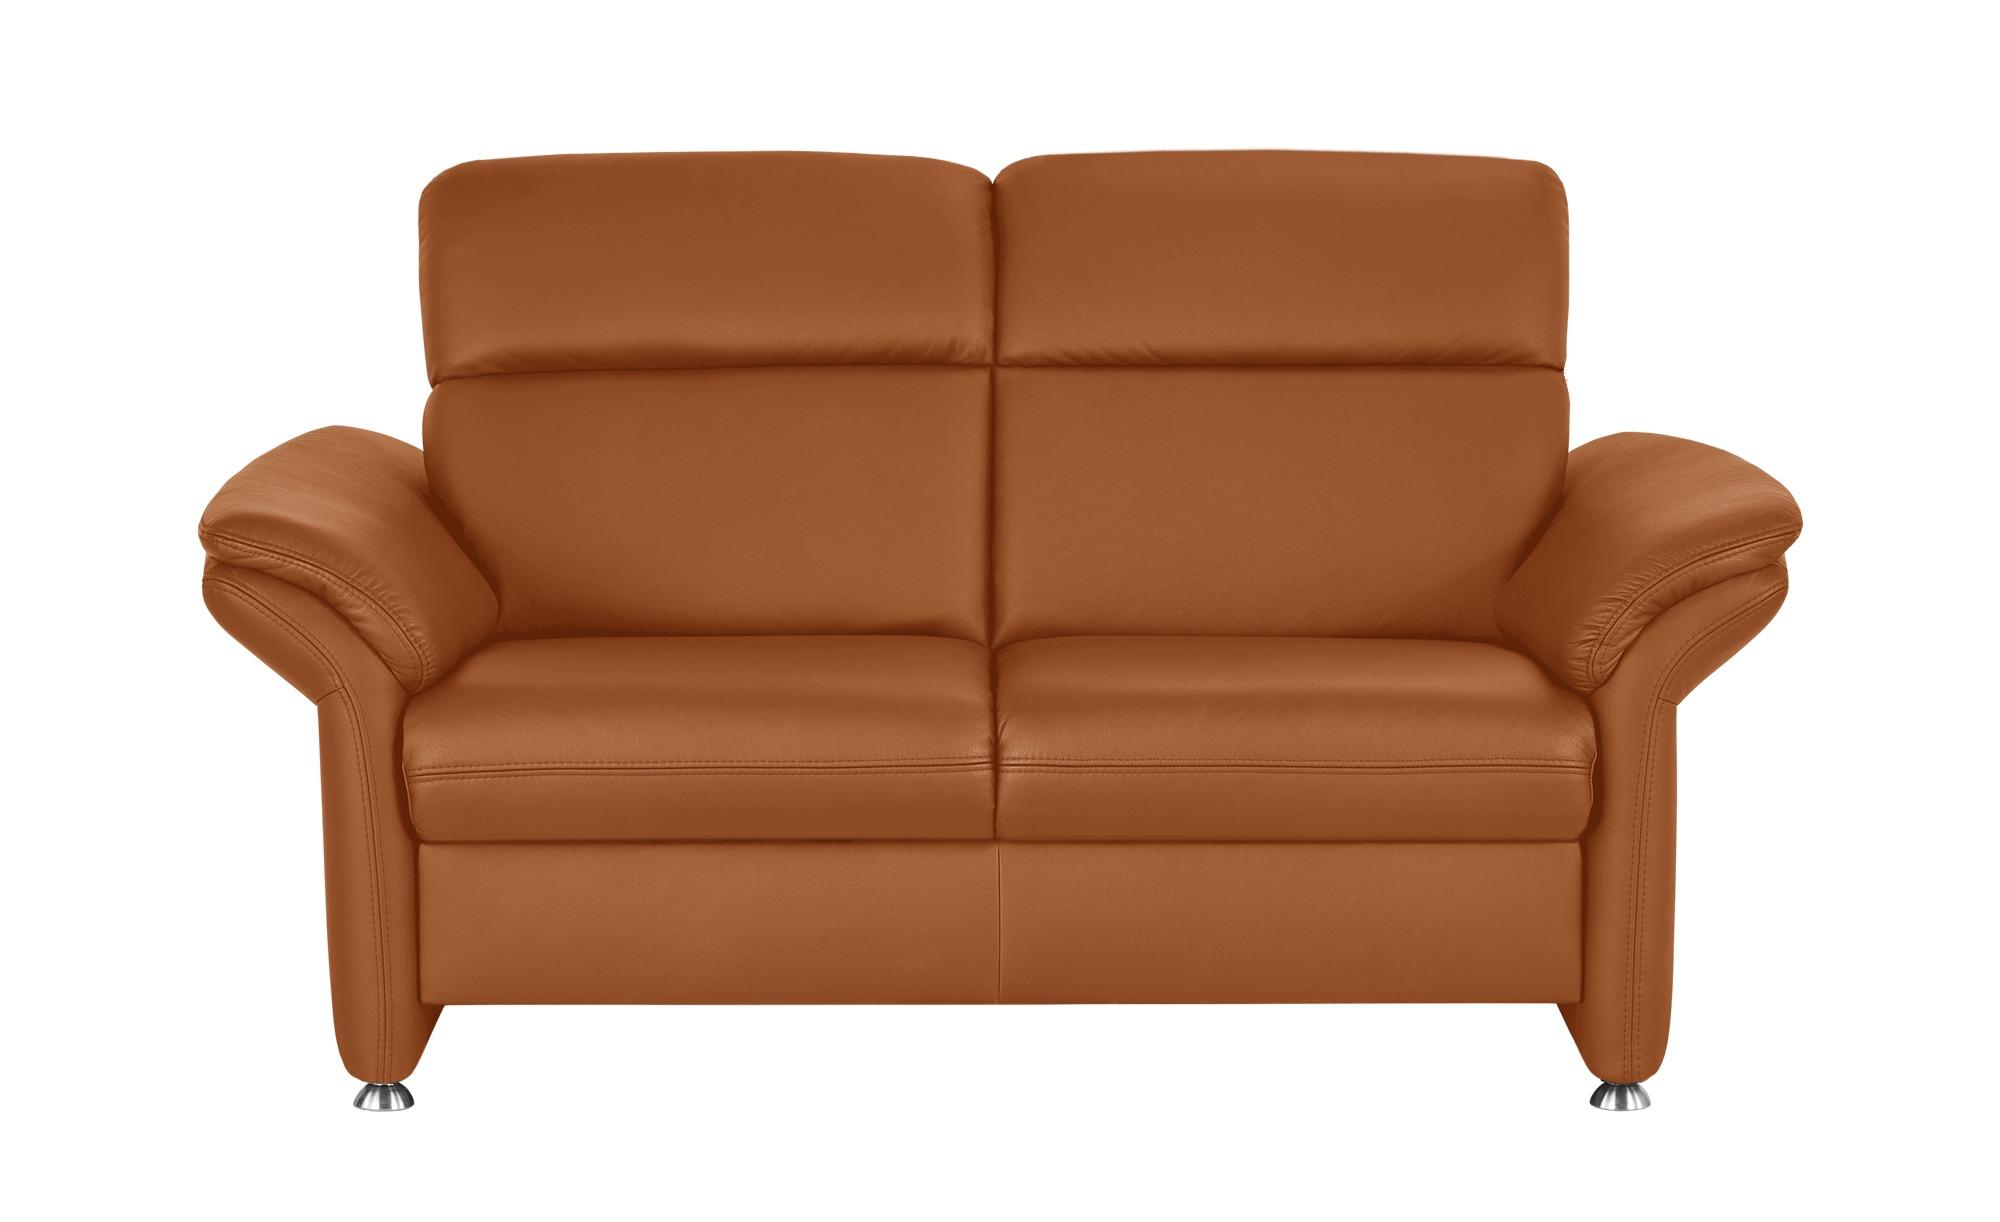 meinsofa ledersofa manon breite 170 cm h he 94 cm orange online kaufen bei woonio. Black Bedroom Furniture Sets. Home Design Ideas